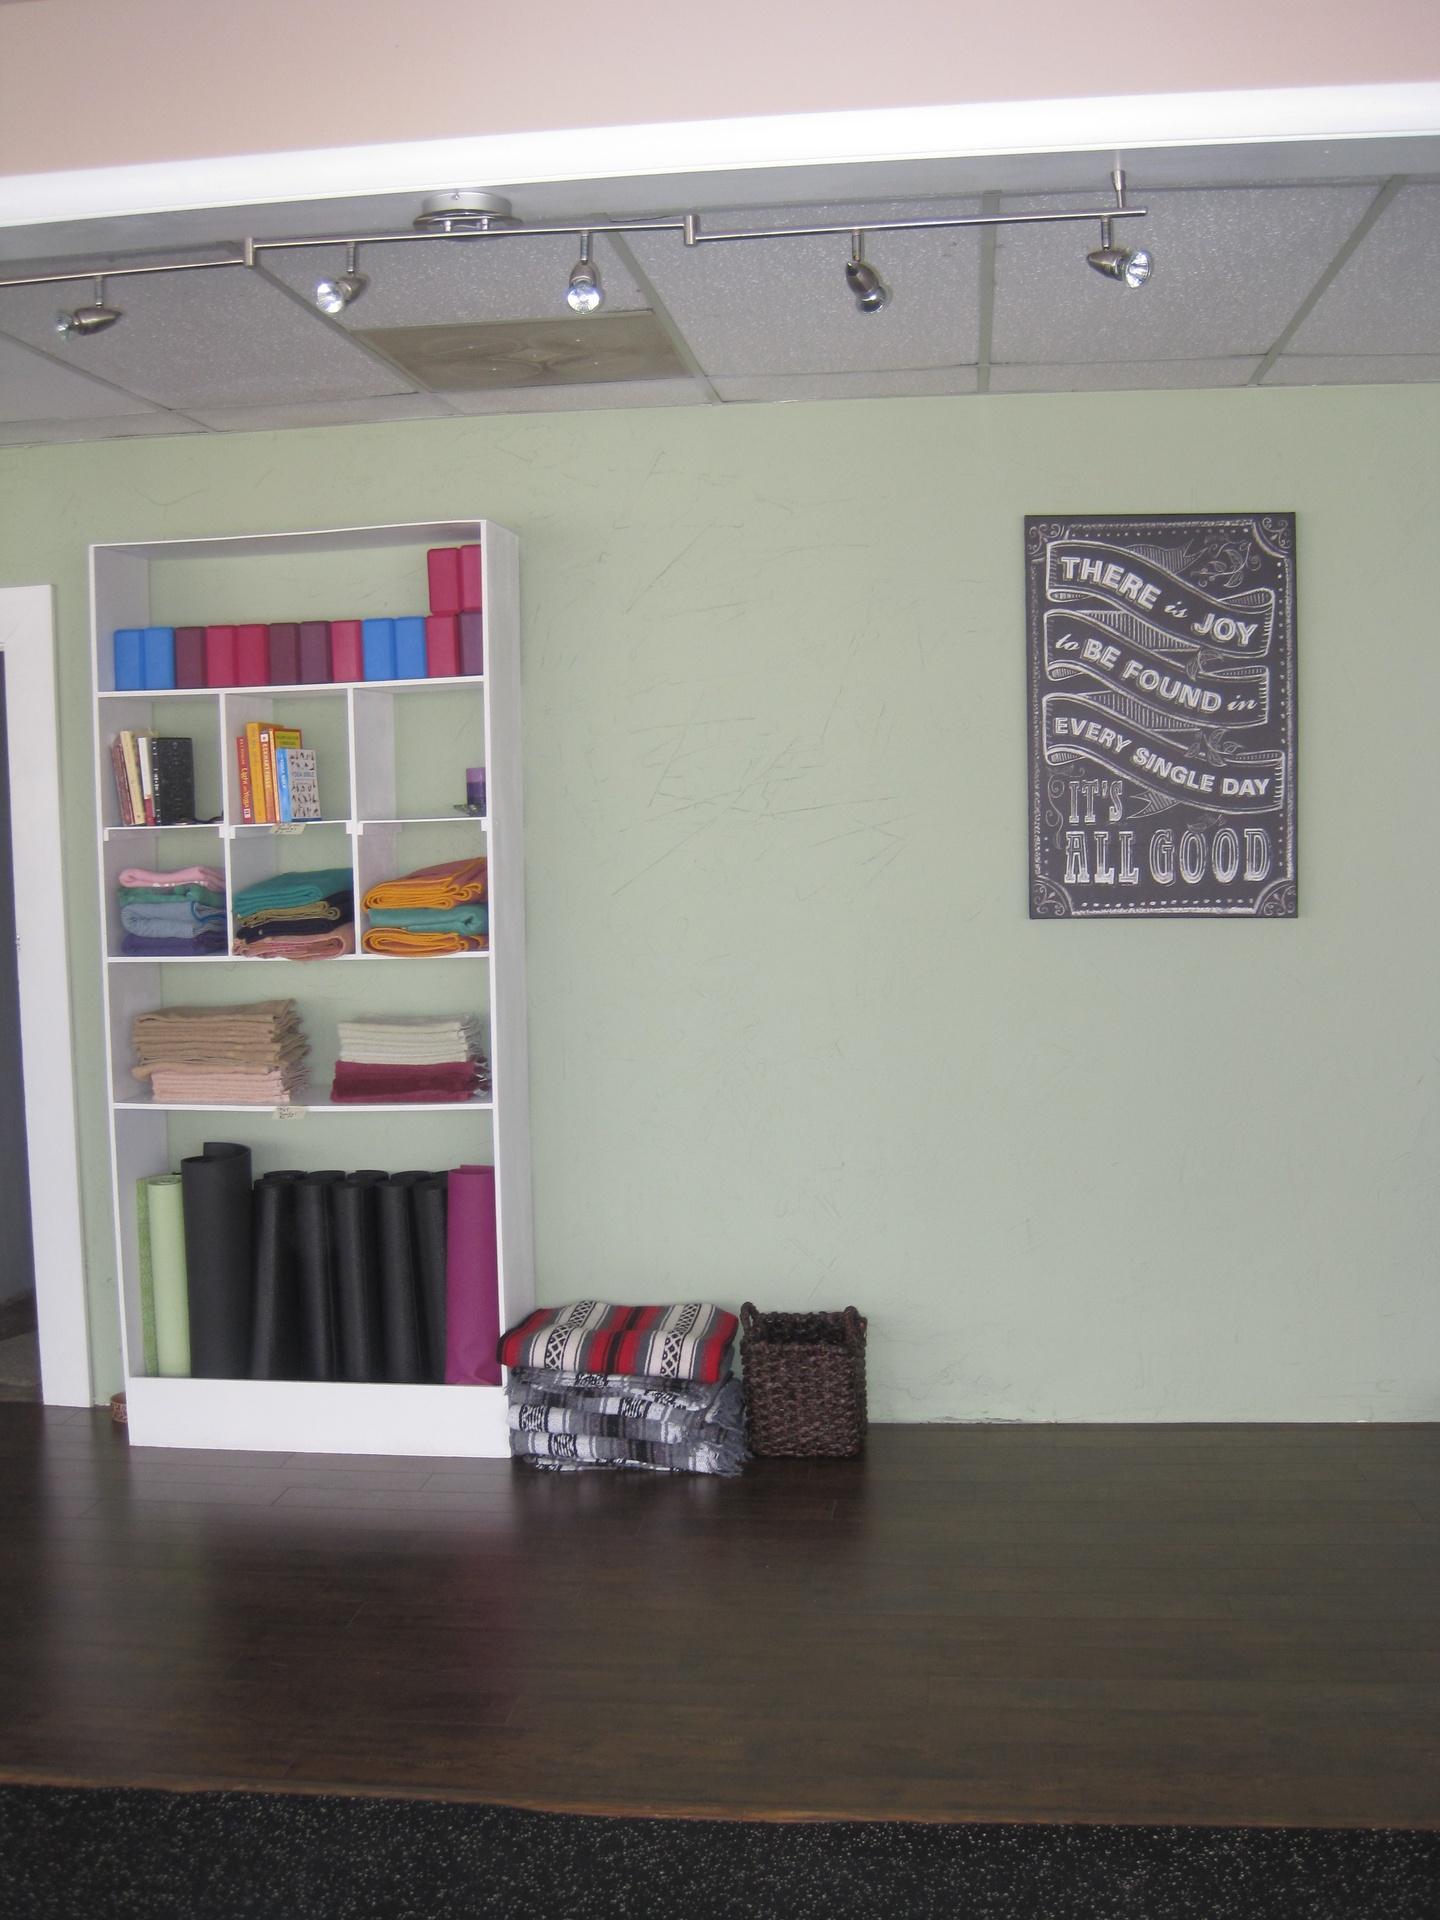 Mat,Blocks, Towels and Books